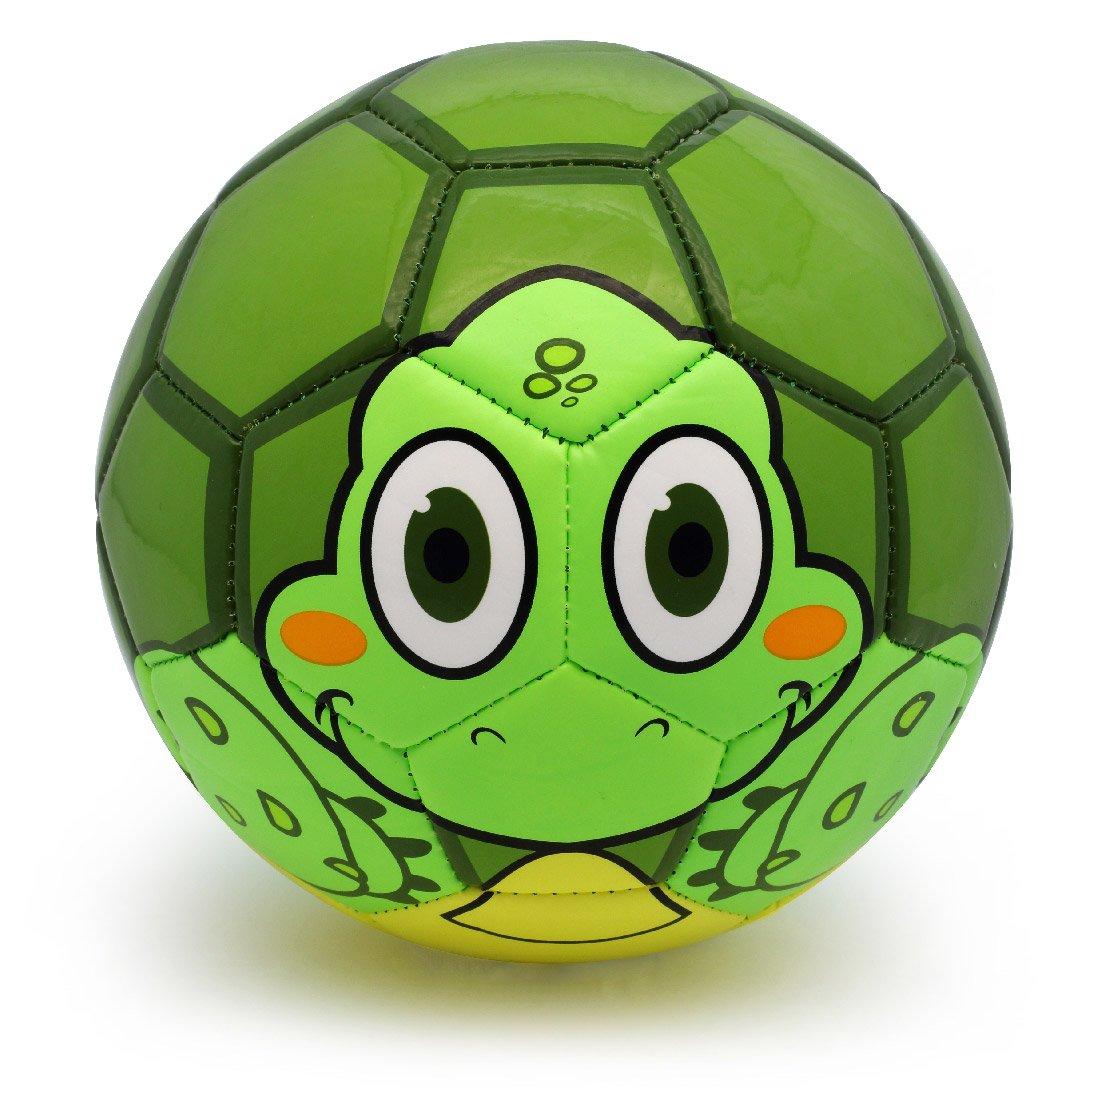 PP Picador Picador幼児用サッカーボールおもちゃCute Cartoon TPUサッカーおもちゃギフトwithポンプ B078TCQ6K6 Green Turtle Green Turtle